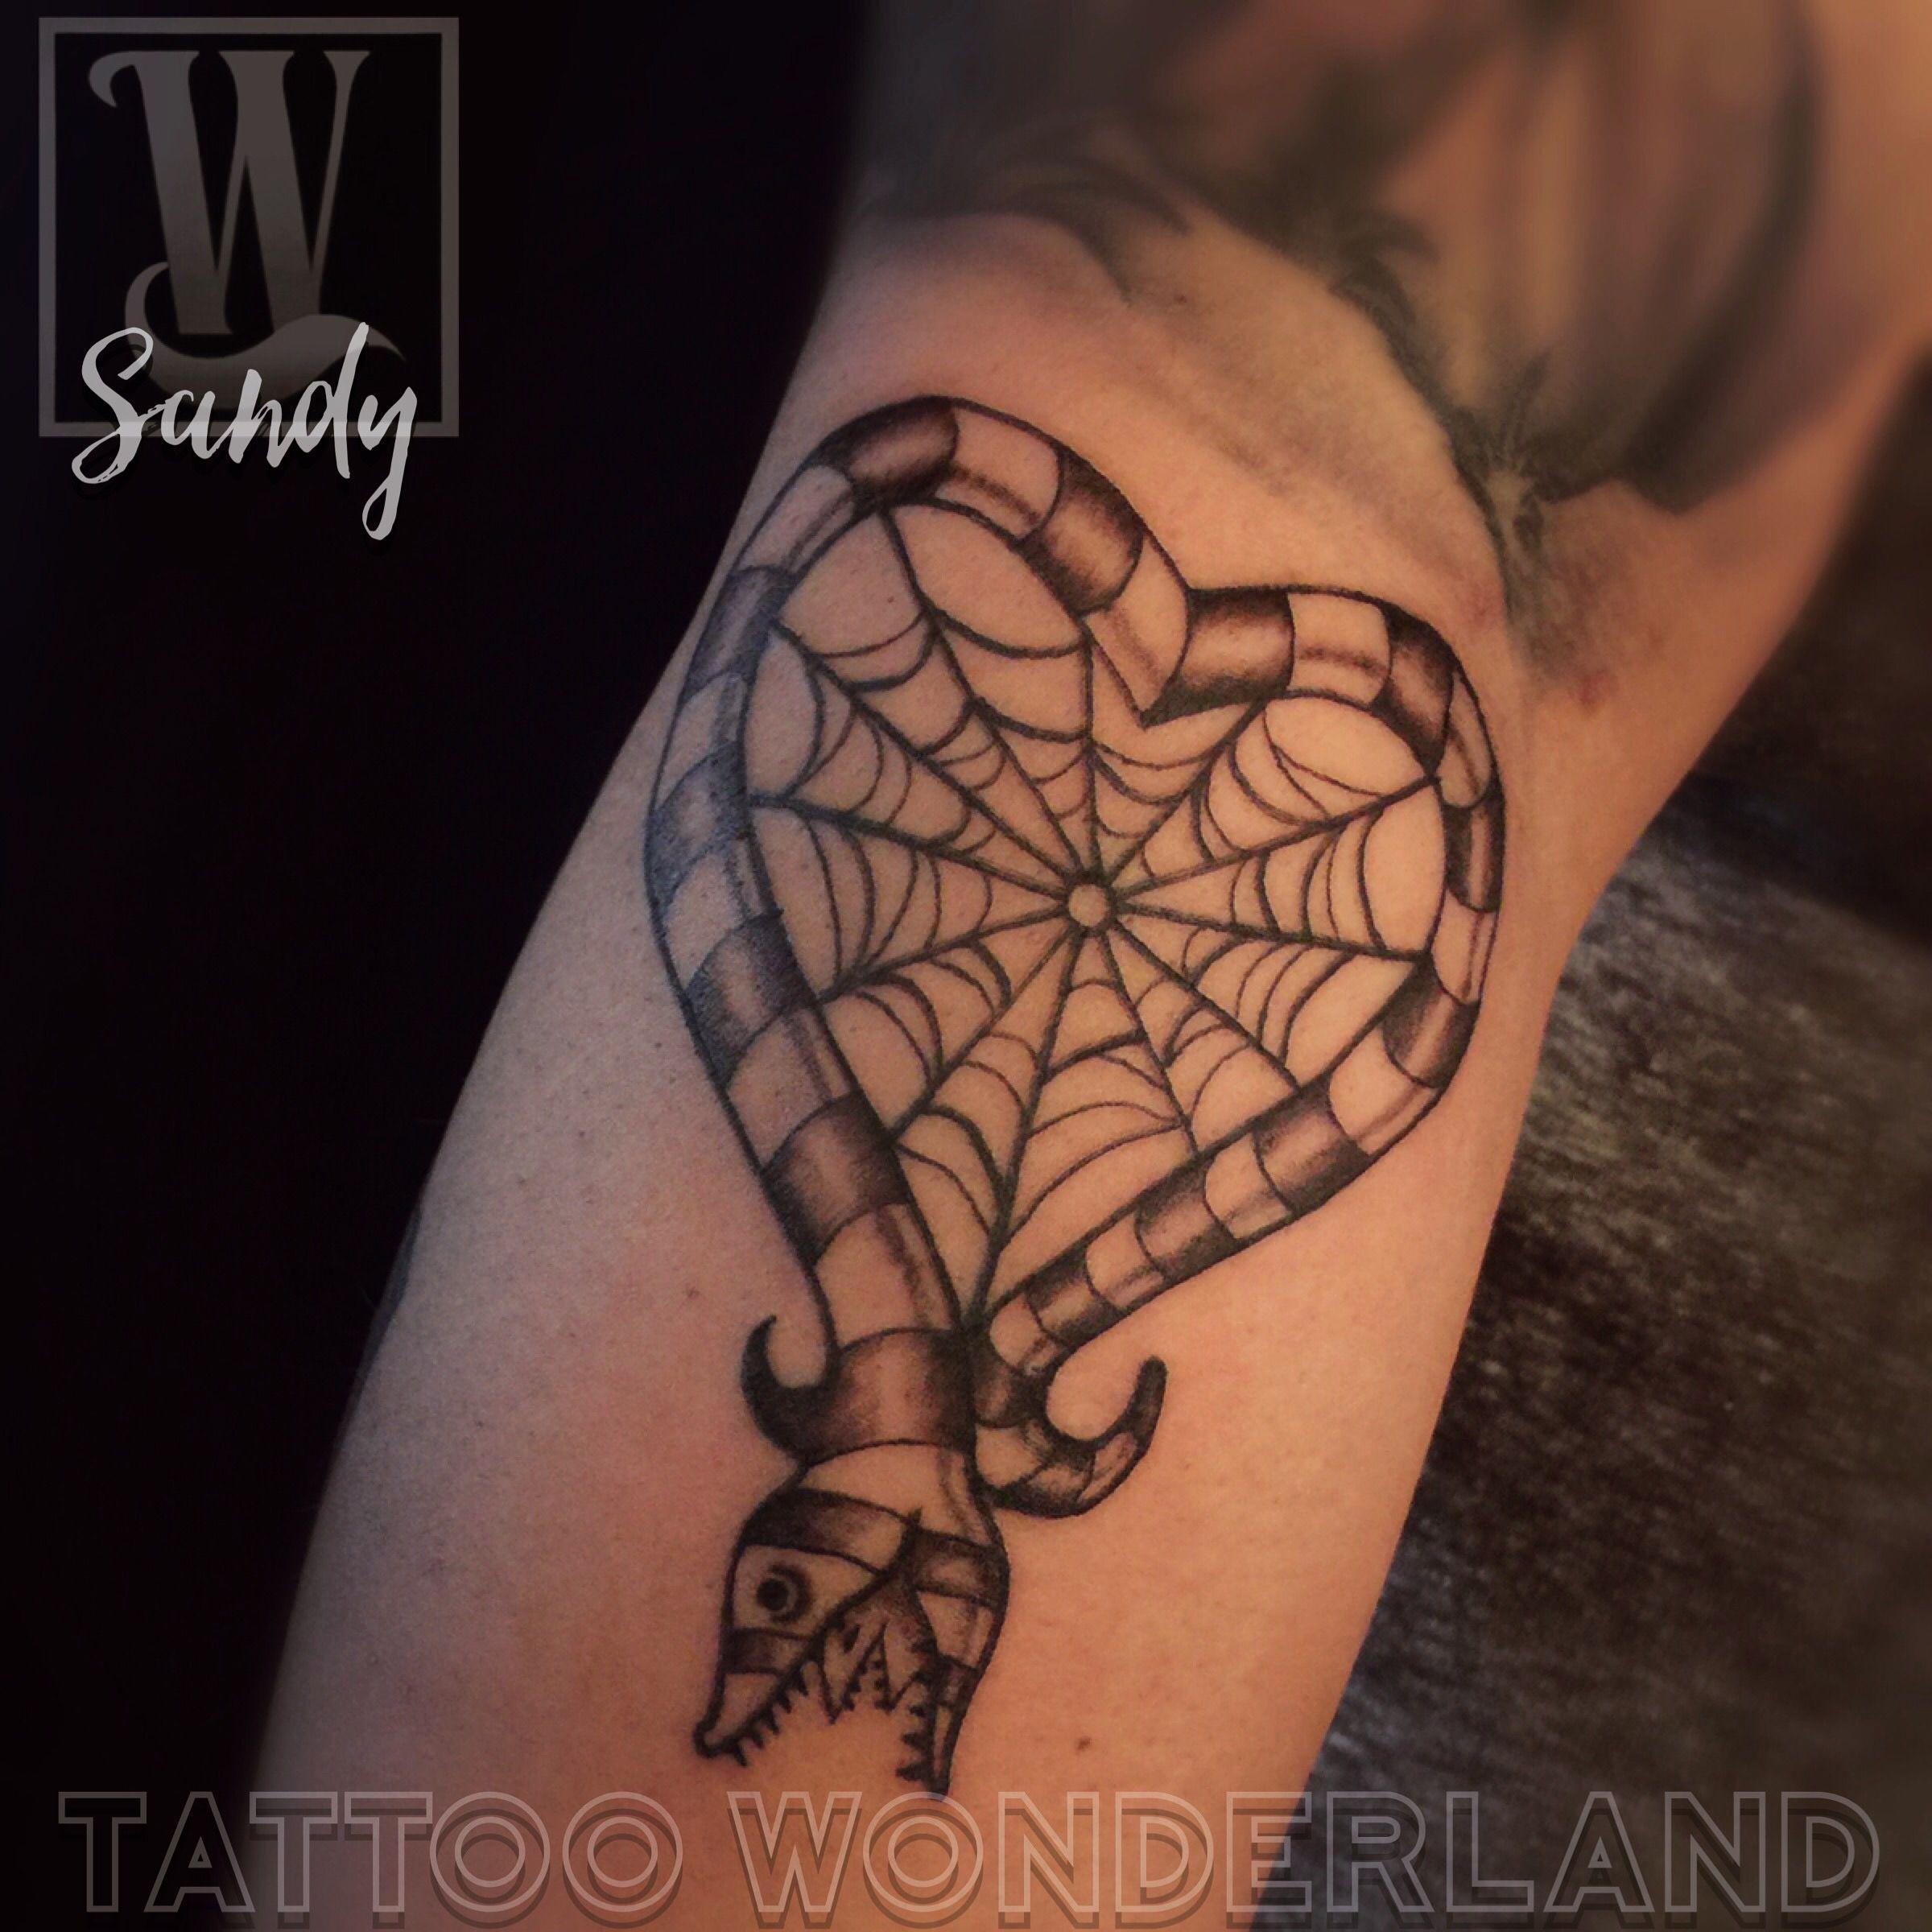 Pin By Ashley Carmer On Tattoo Ideas Tattoos Tattoo Clothing Beetlejuice Tattoo